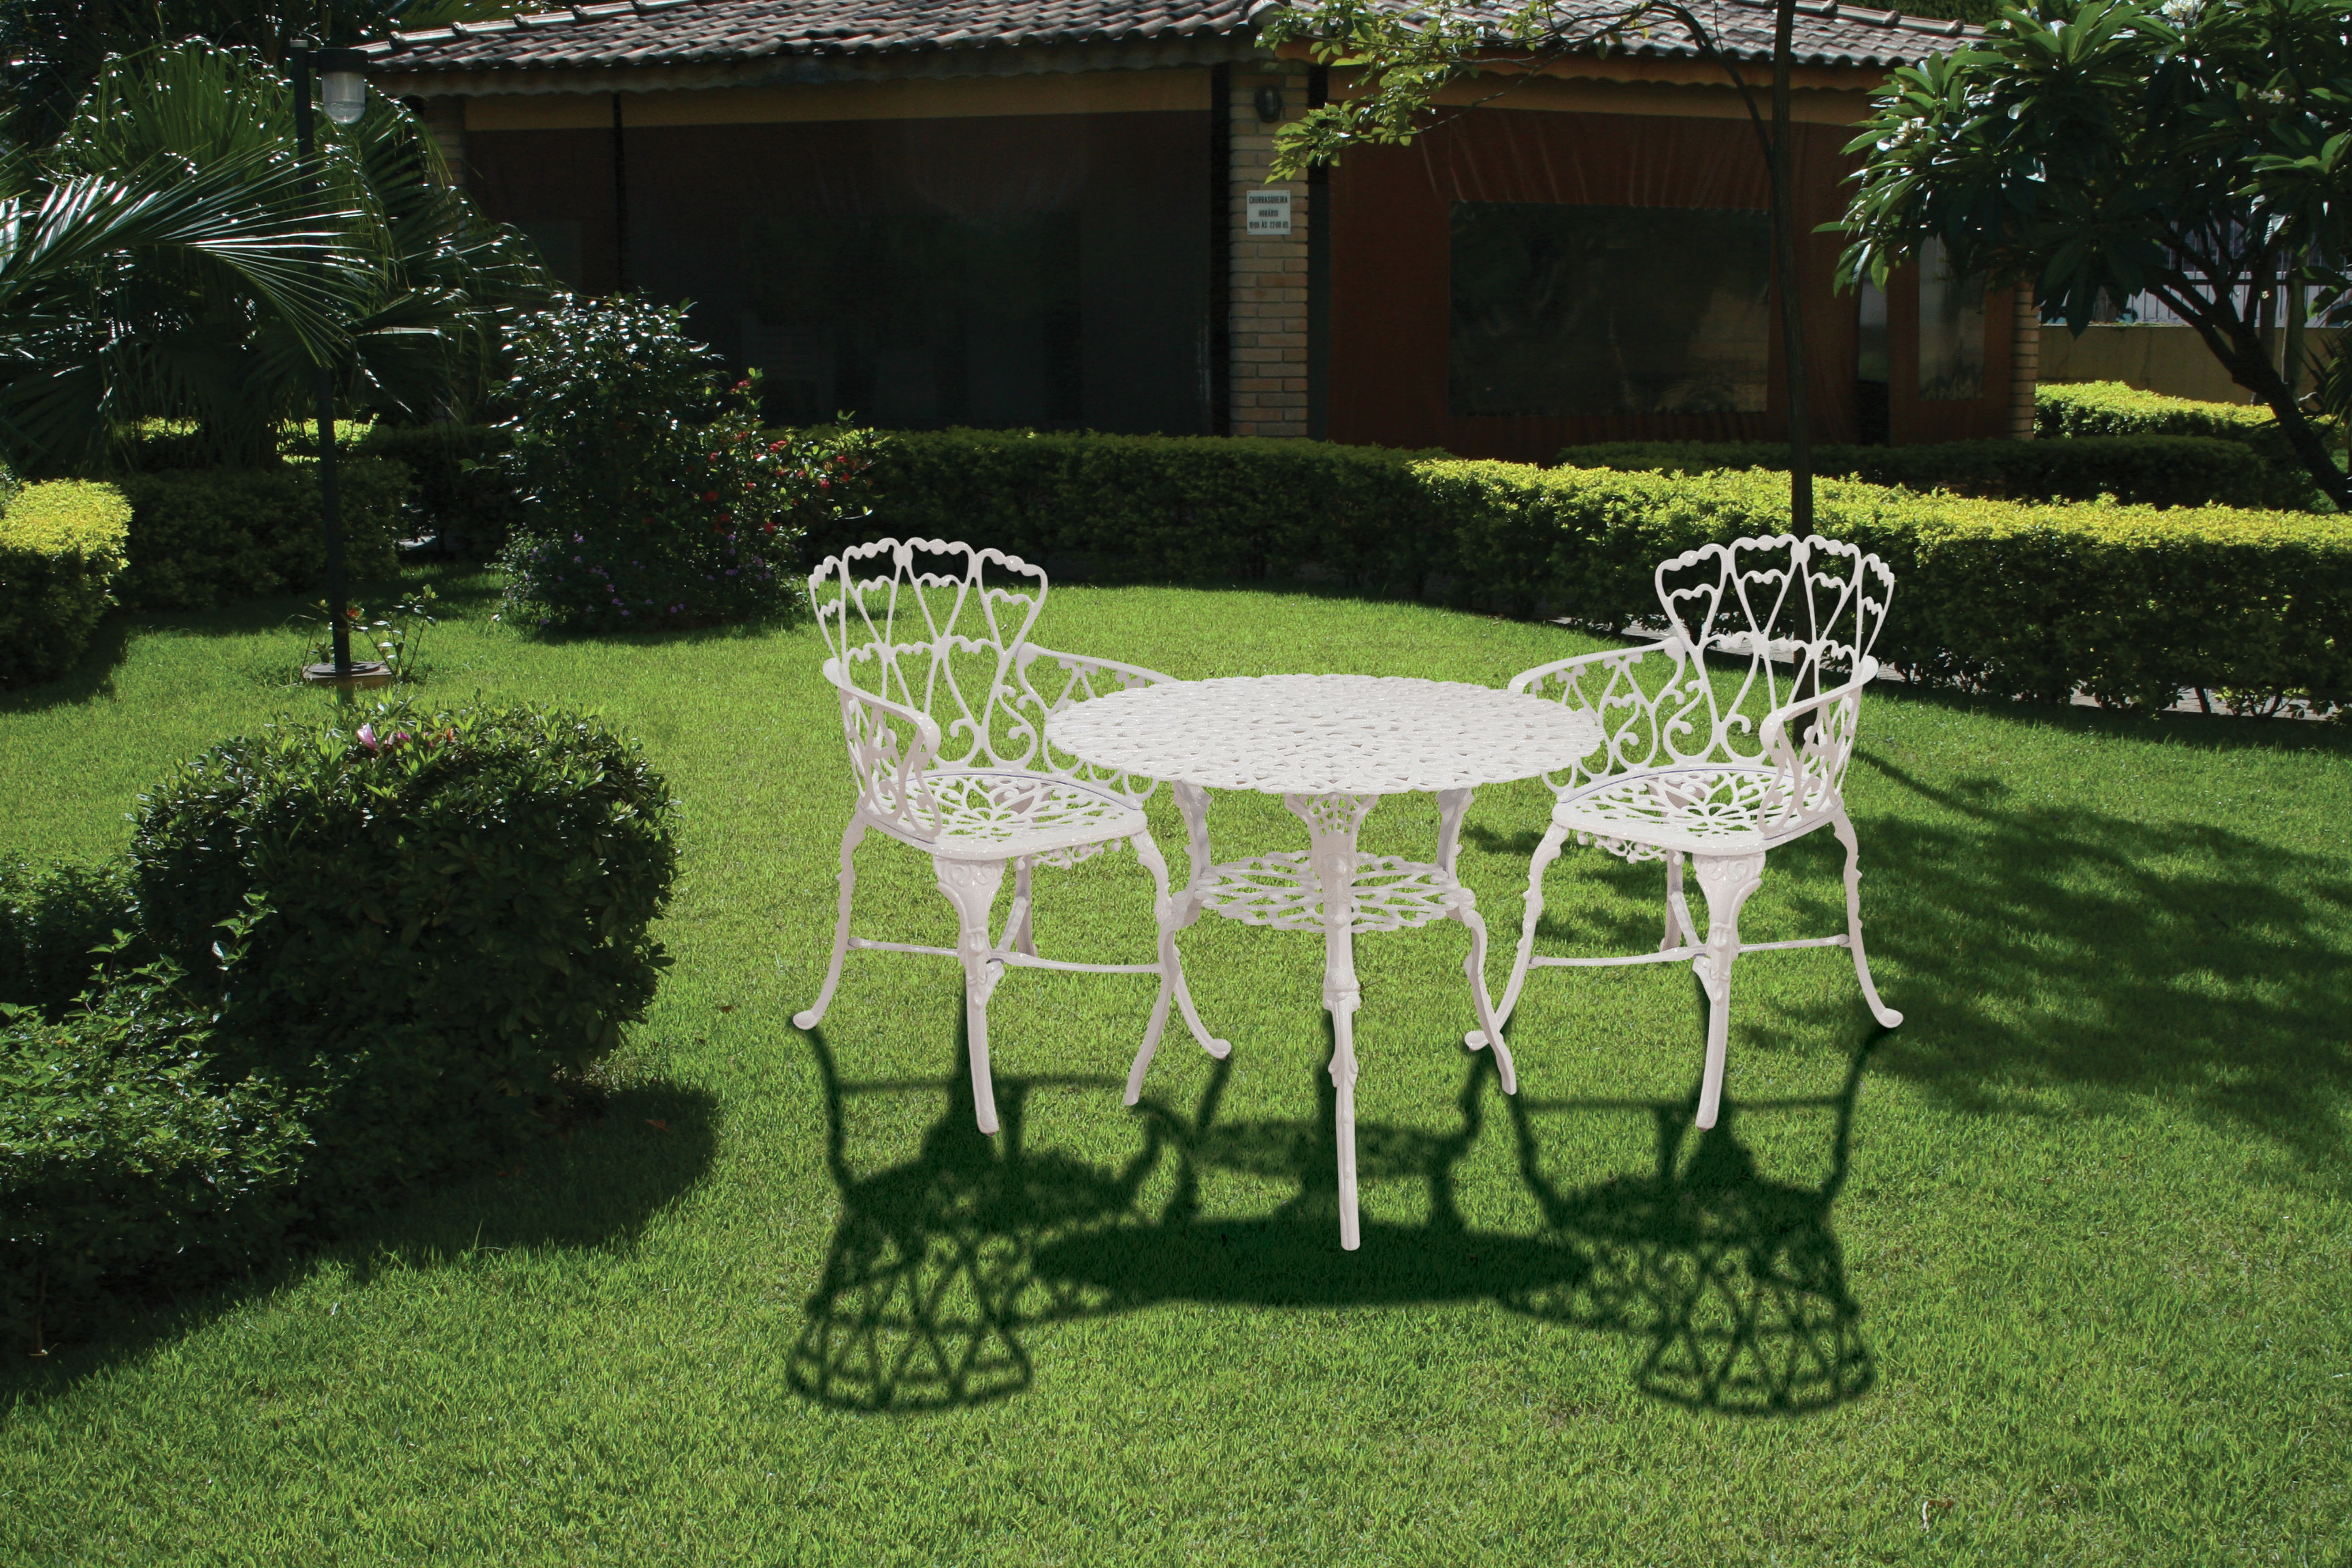 Mesa e poltronas de alum nio no jardim leroy merlin for Mesas exterior baratas